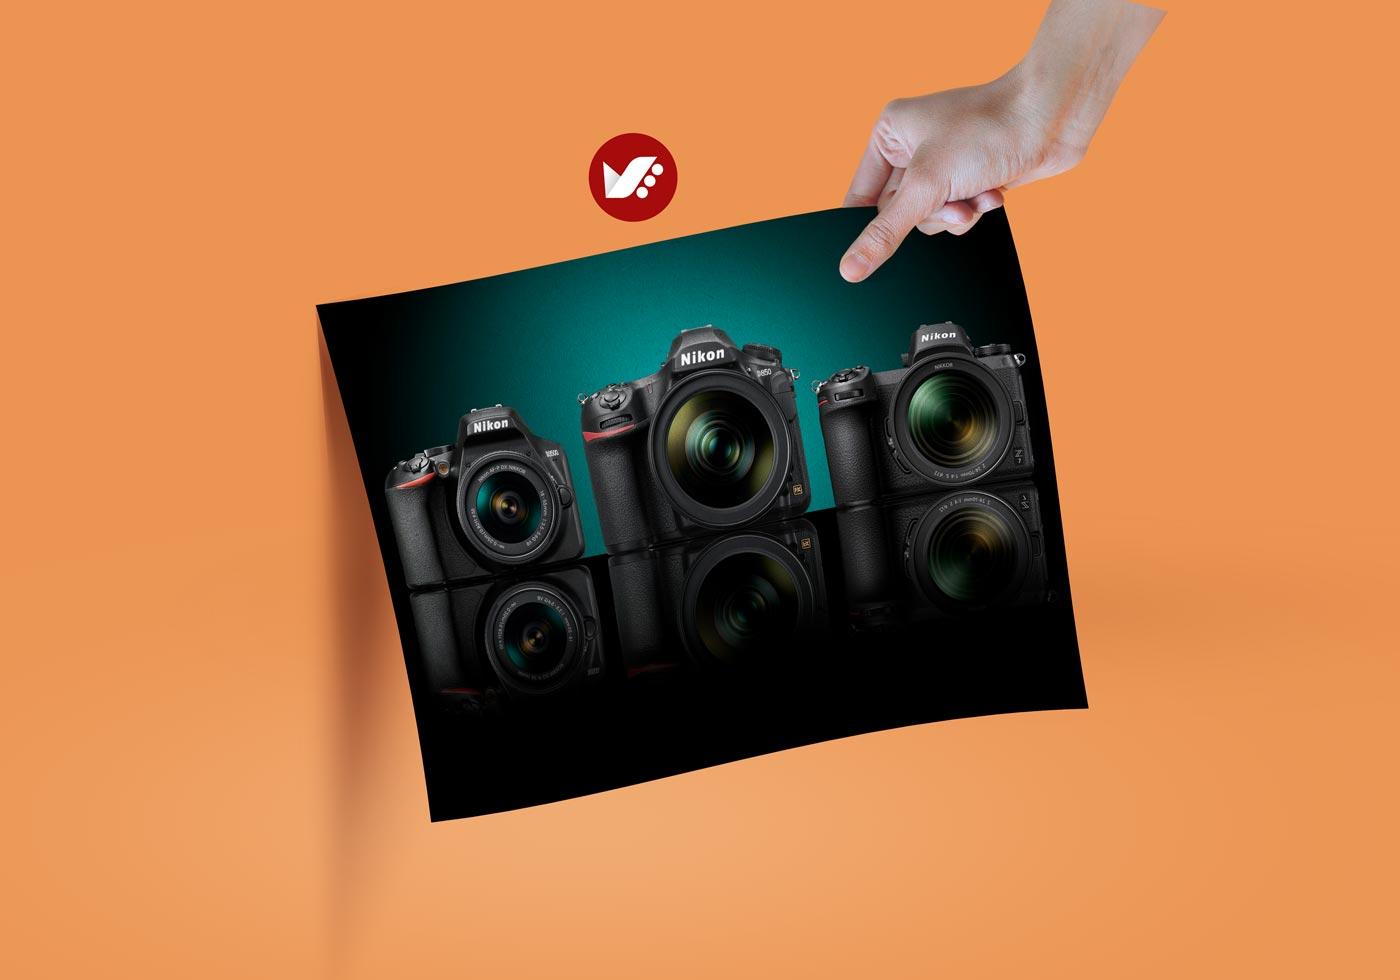 nikon camera - شاتر پرده جلو الکترونیکی